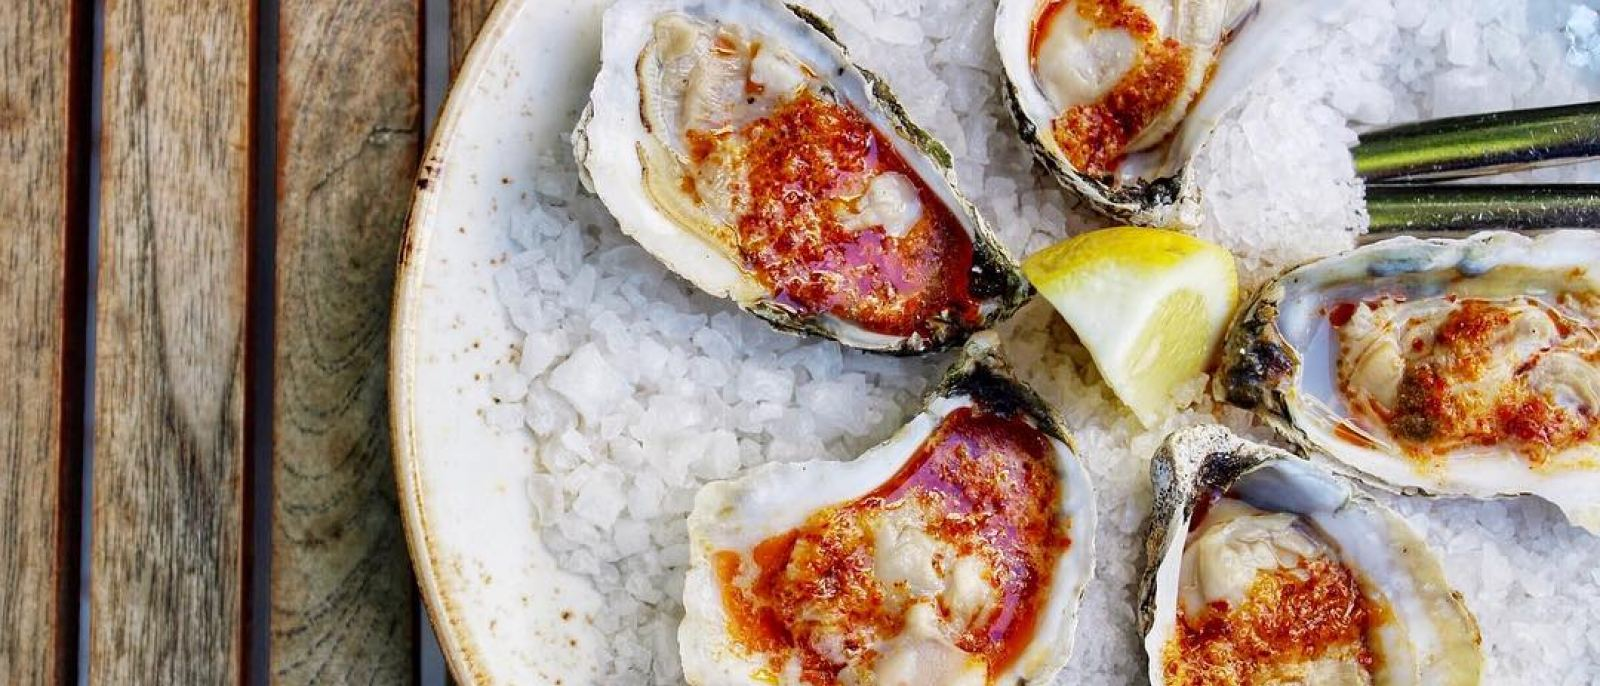 Rappahannock Oyster Bar DTLA grilled oysters